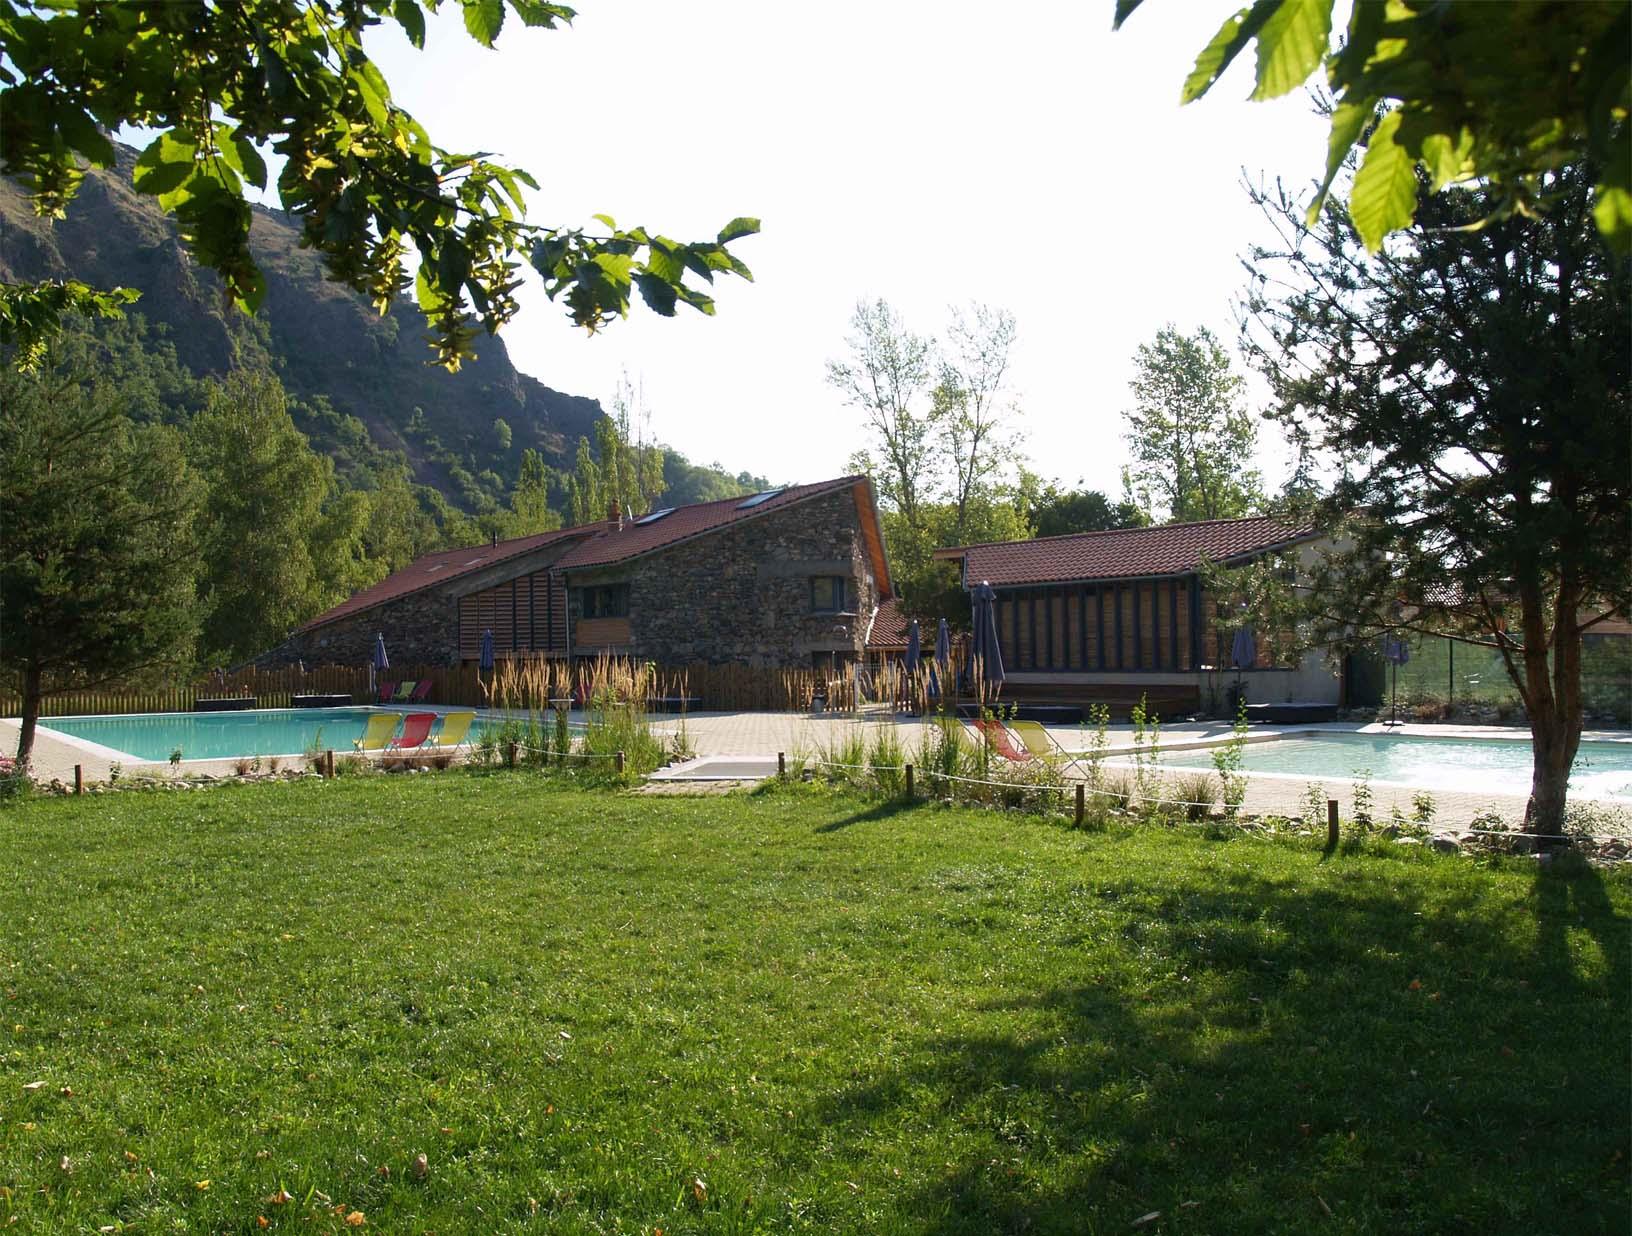 Frhpa campsite haute loire 43 for Chamalieres piscine